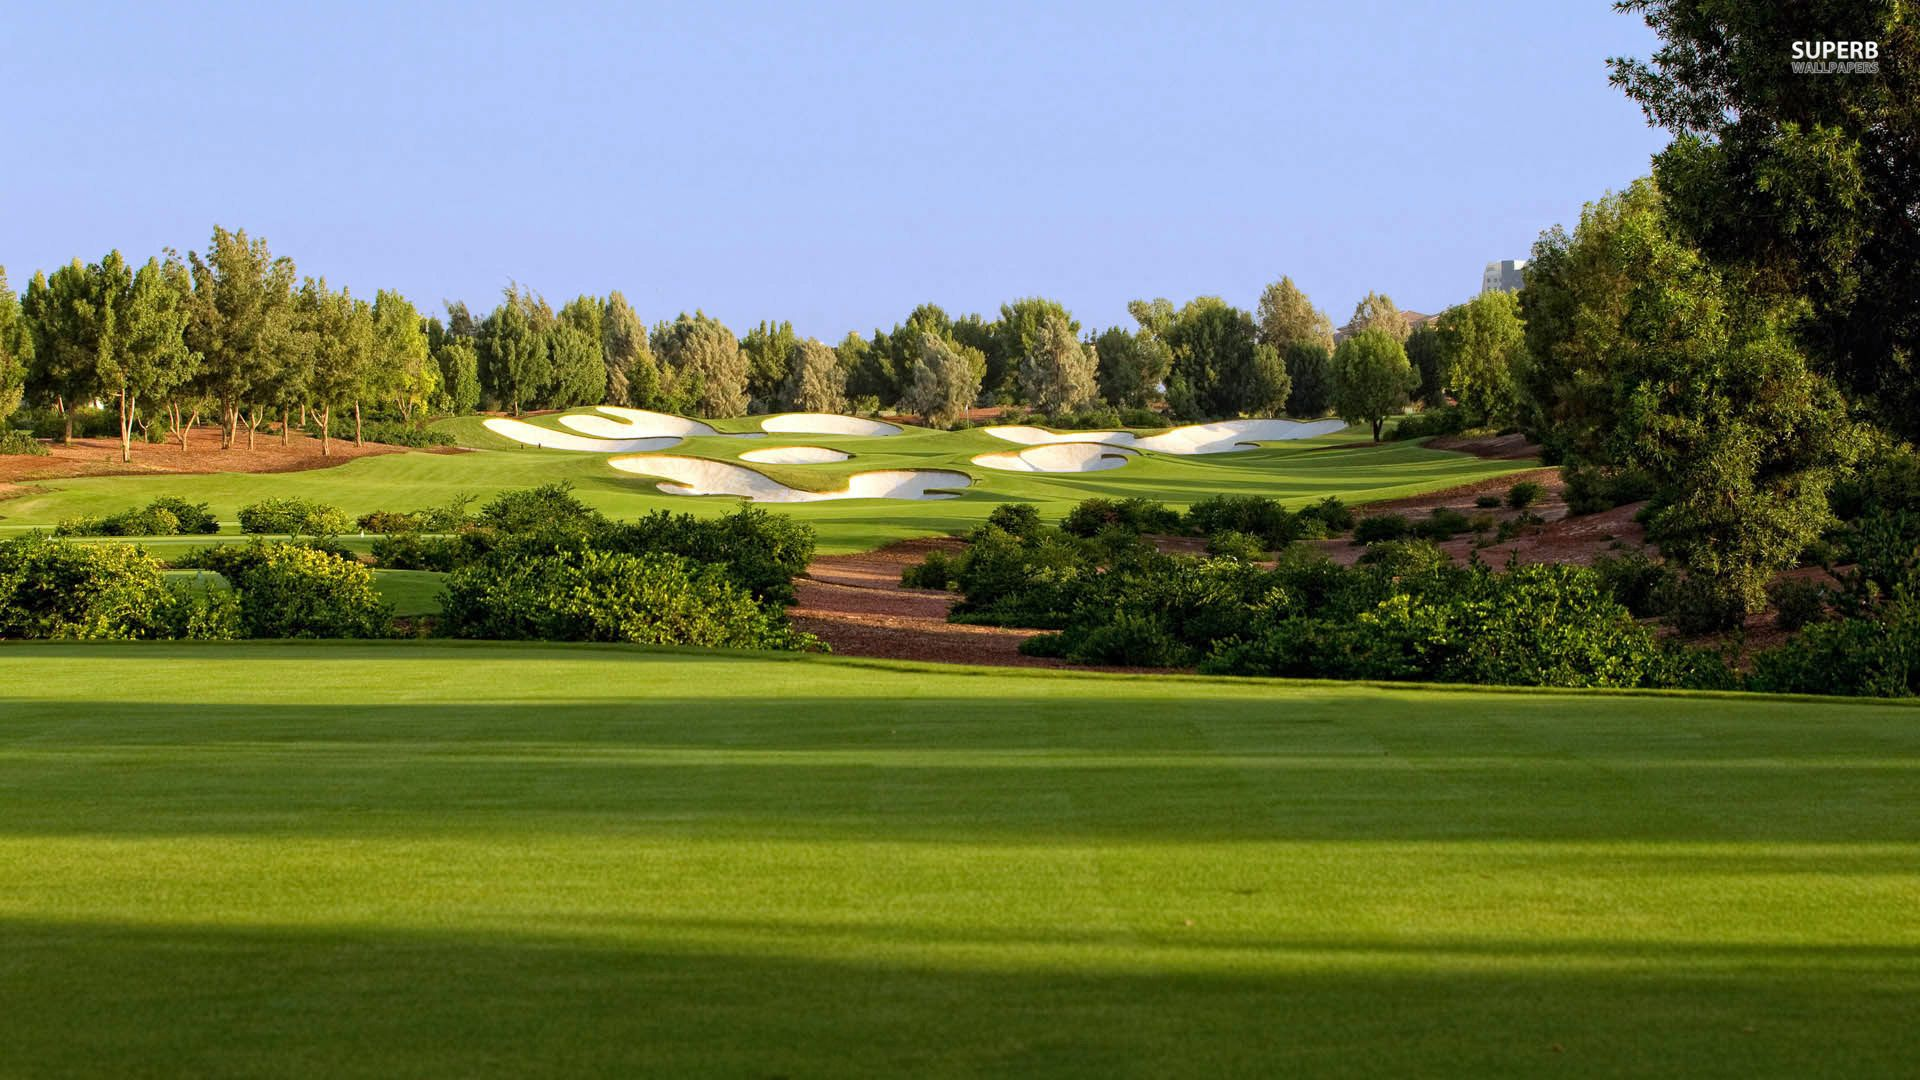 Download Jumeirah Golf Estates 1920x1080 HD Wallpaper